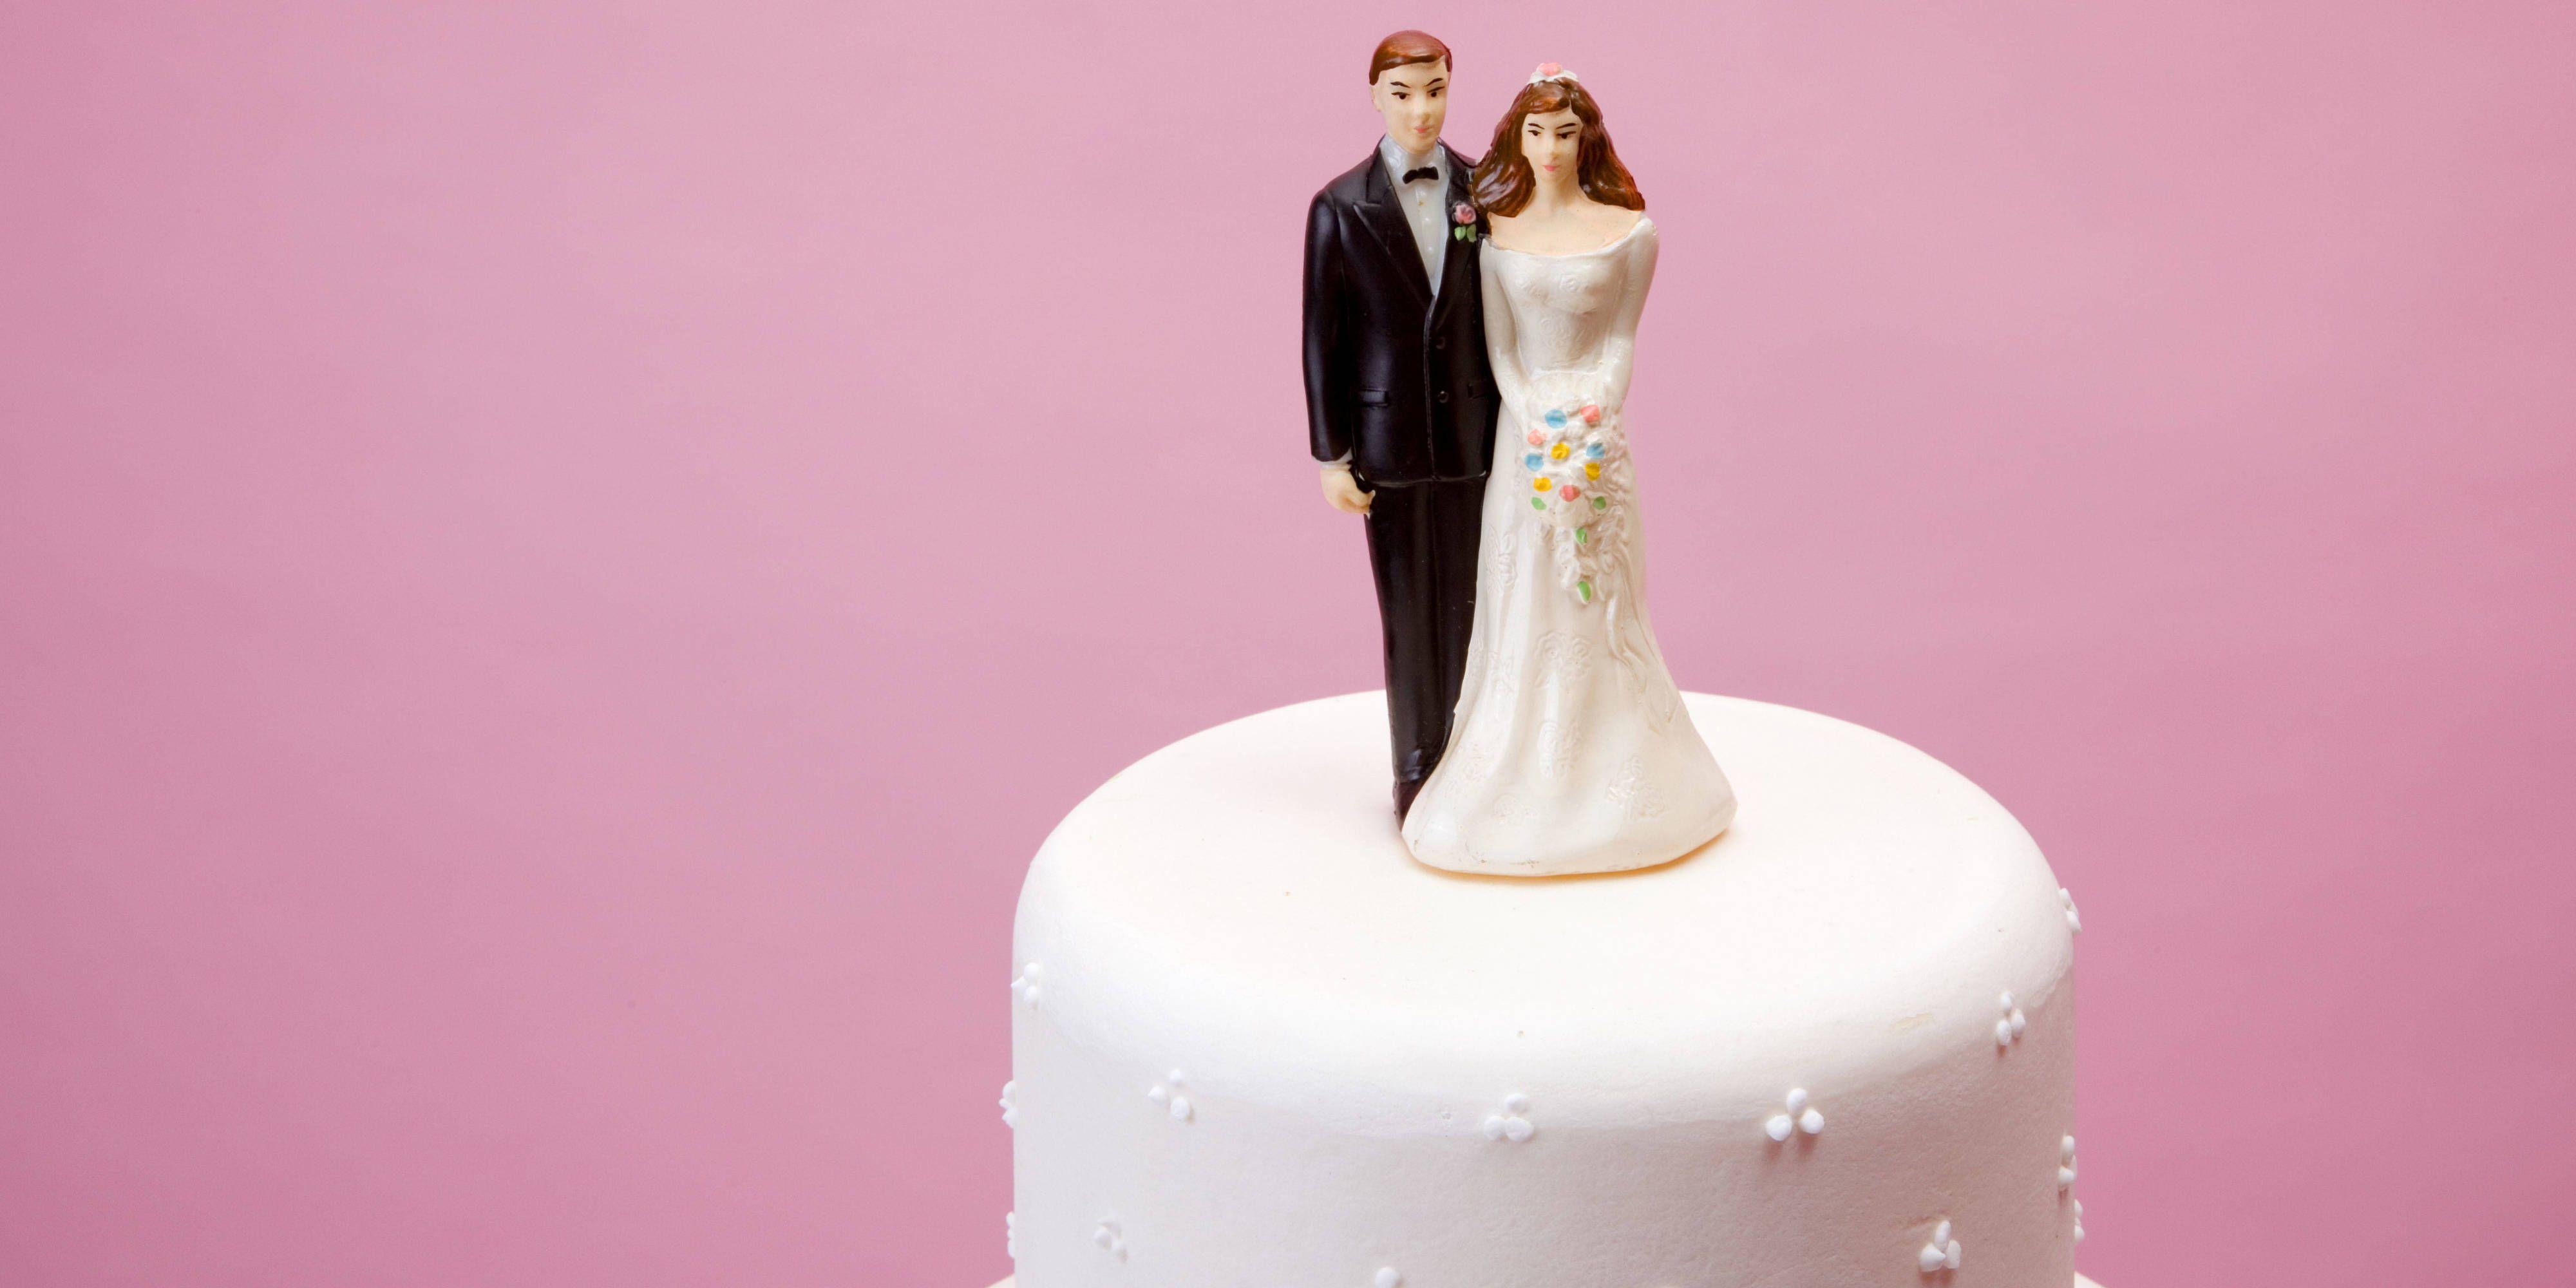 Wedding first night sex stories